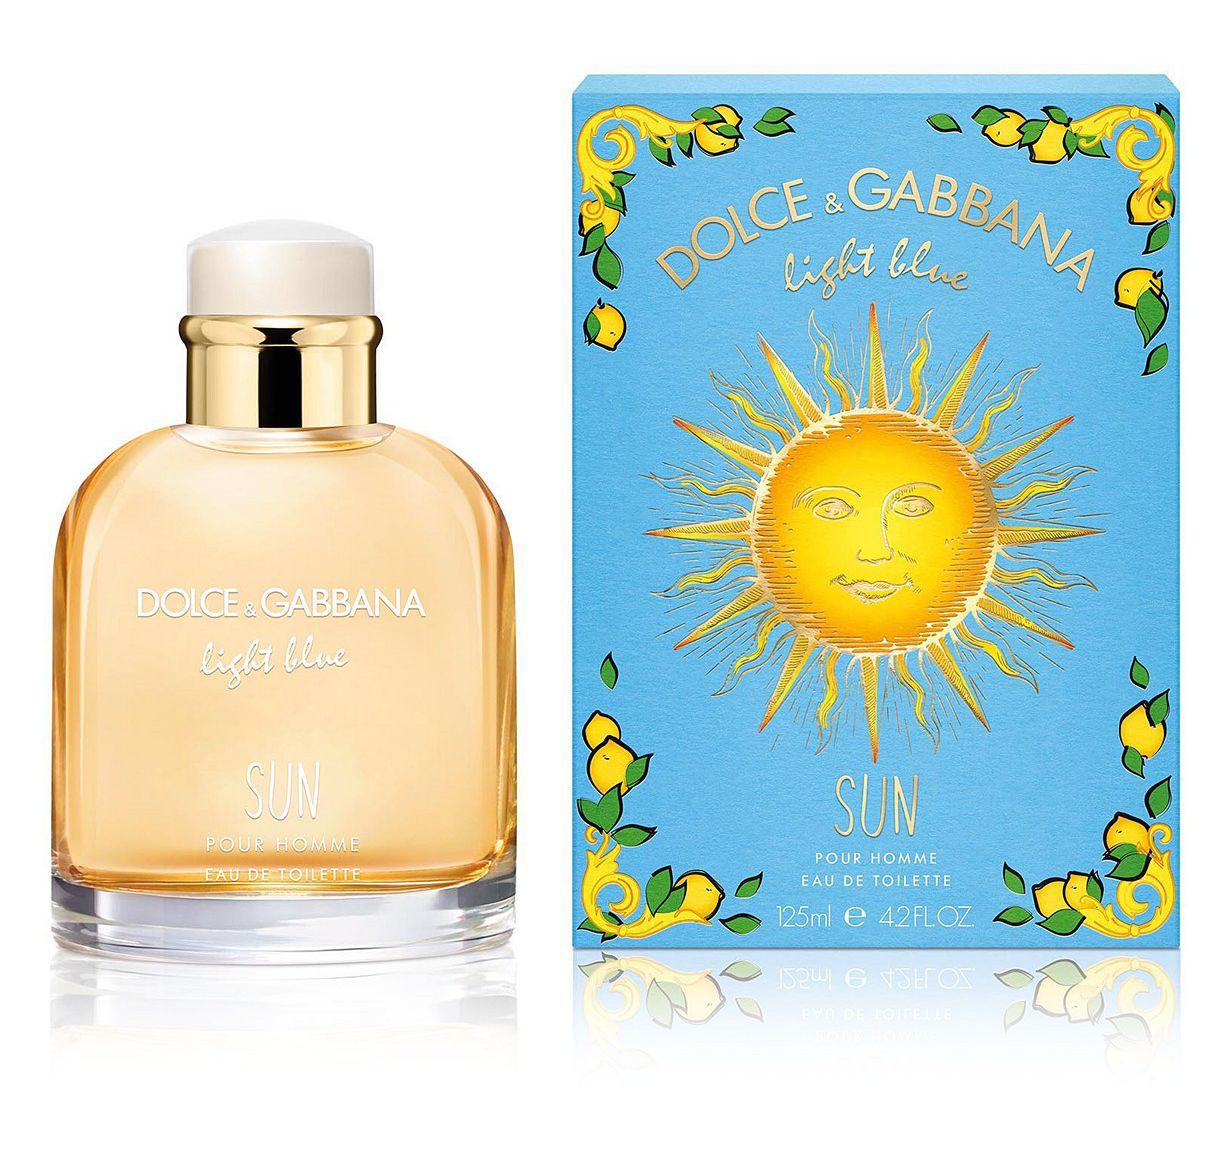 Light Blue And Beige Living Room: Light Blue Sun Pour Homme Dolce&Gabbana Cologne